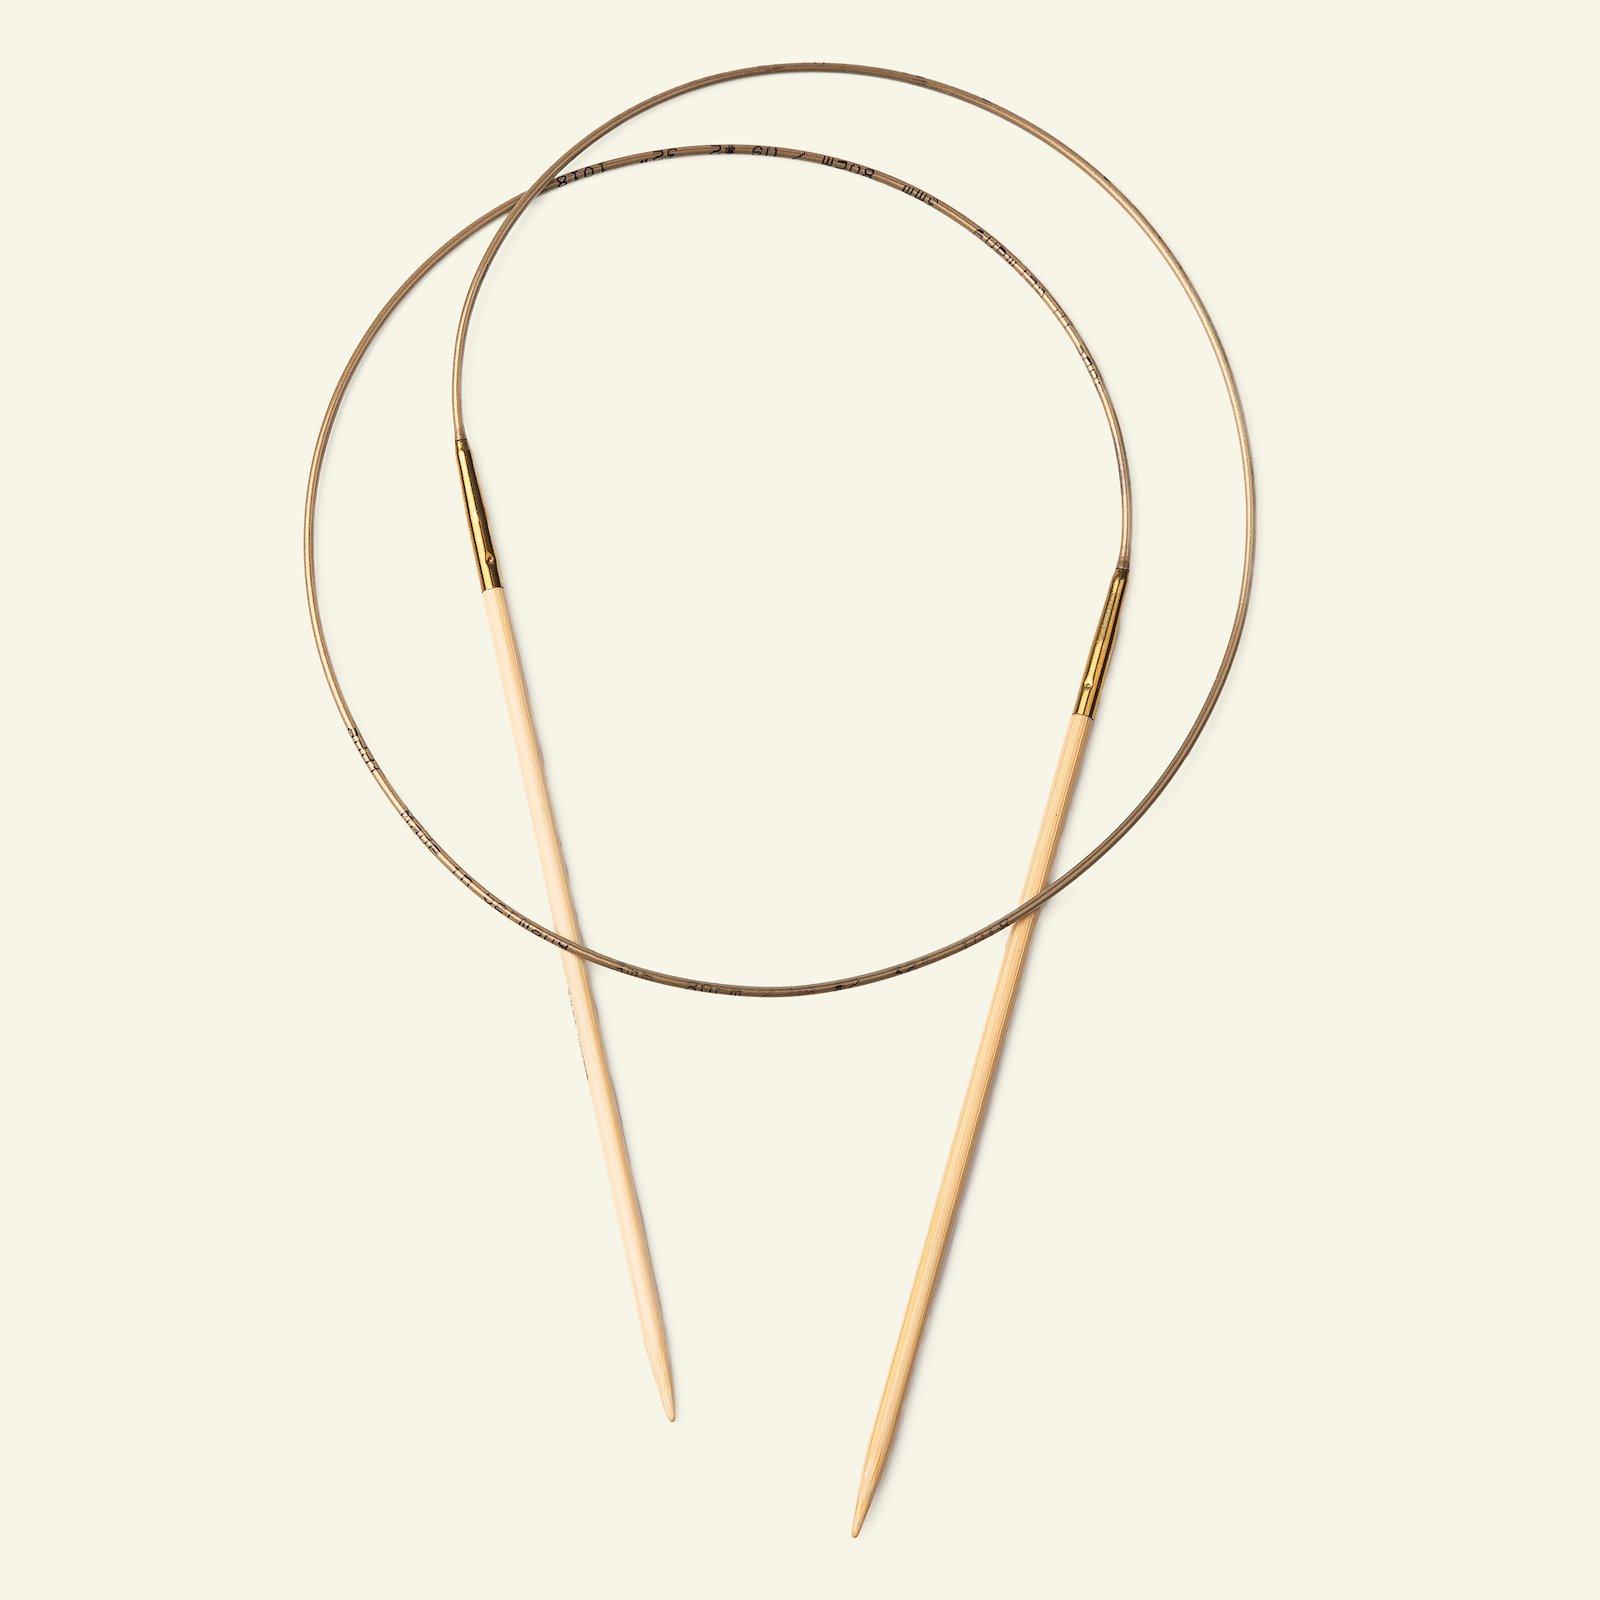 Addi circular needle bamboo 80cm 12mm 83133_pack